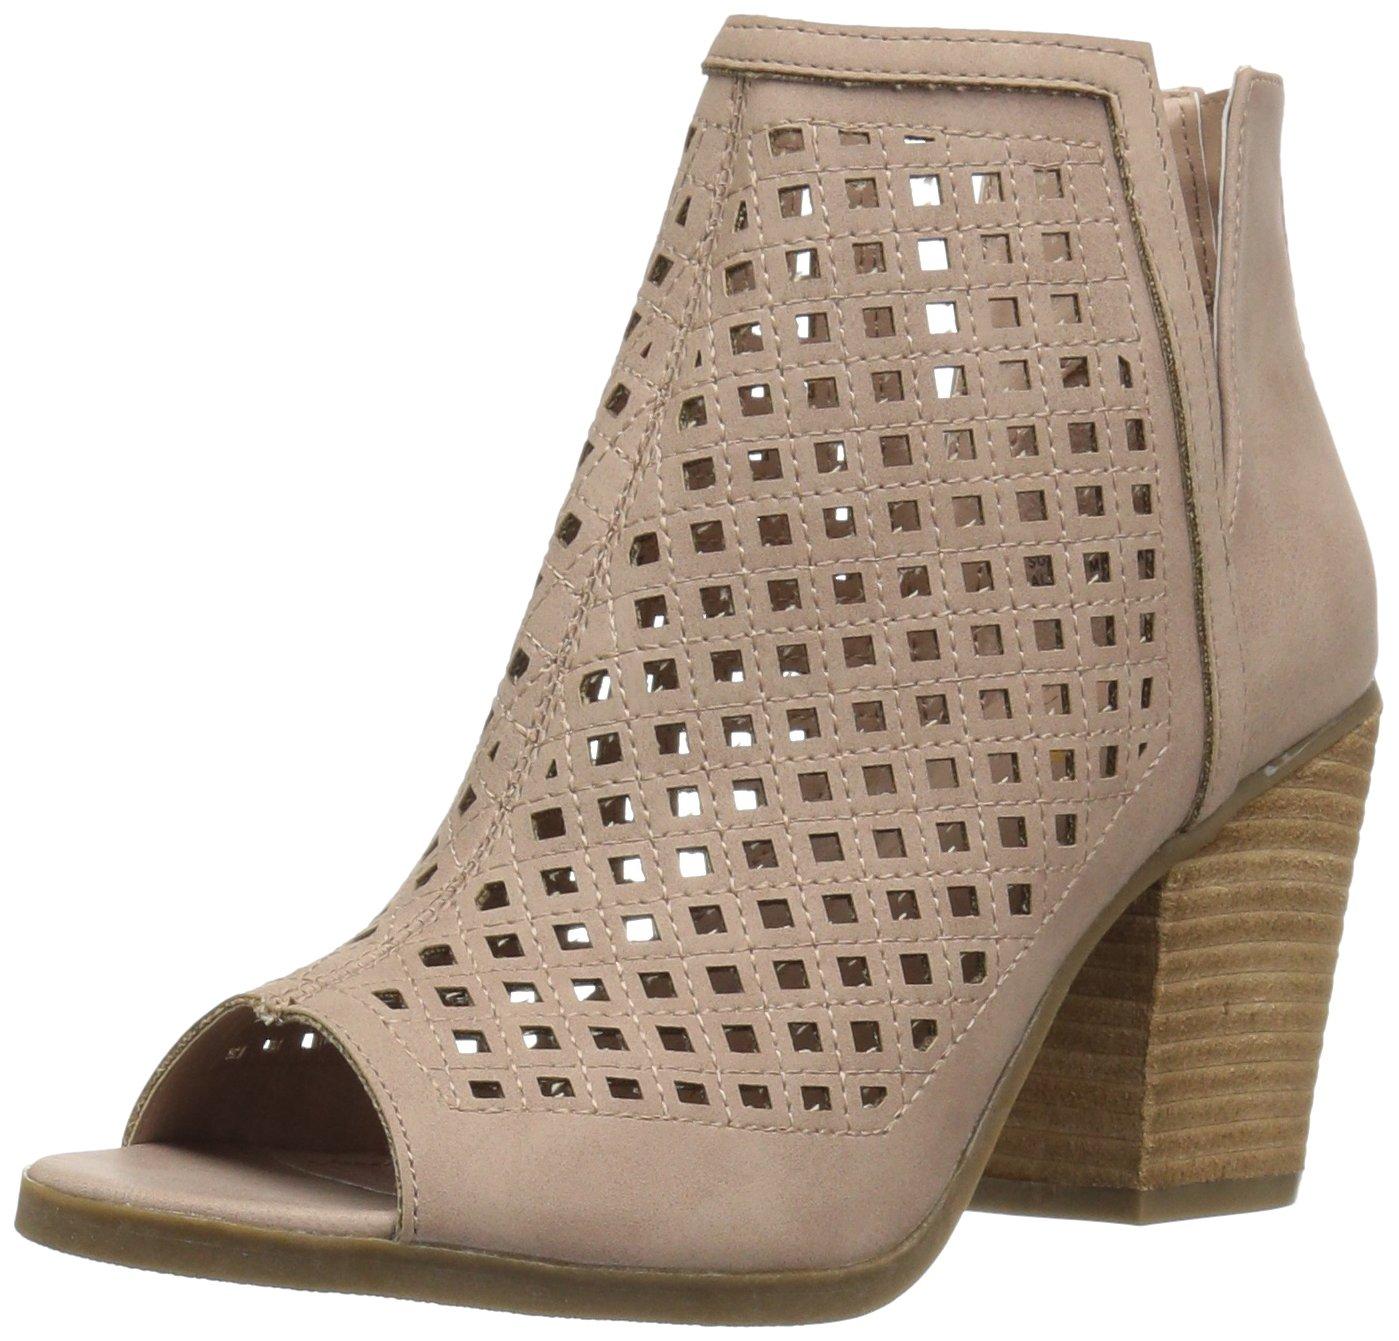 Sugar Women's Vael Perf Open Toe Stacked Block Heel Fashion Ankle Bootie B076BXGPFR 10 B(M) US|Blush